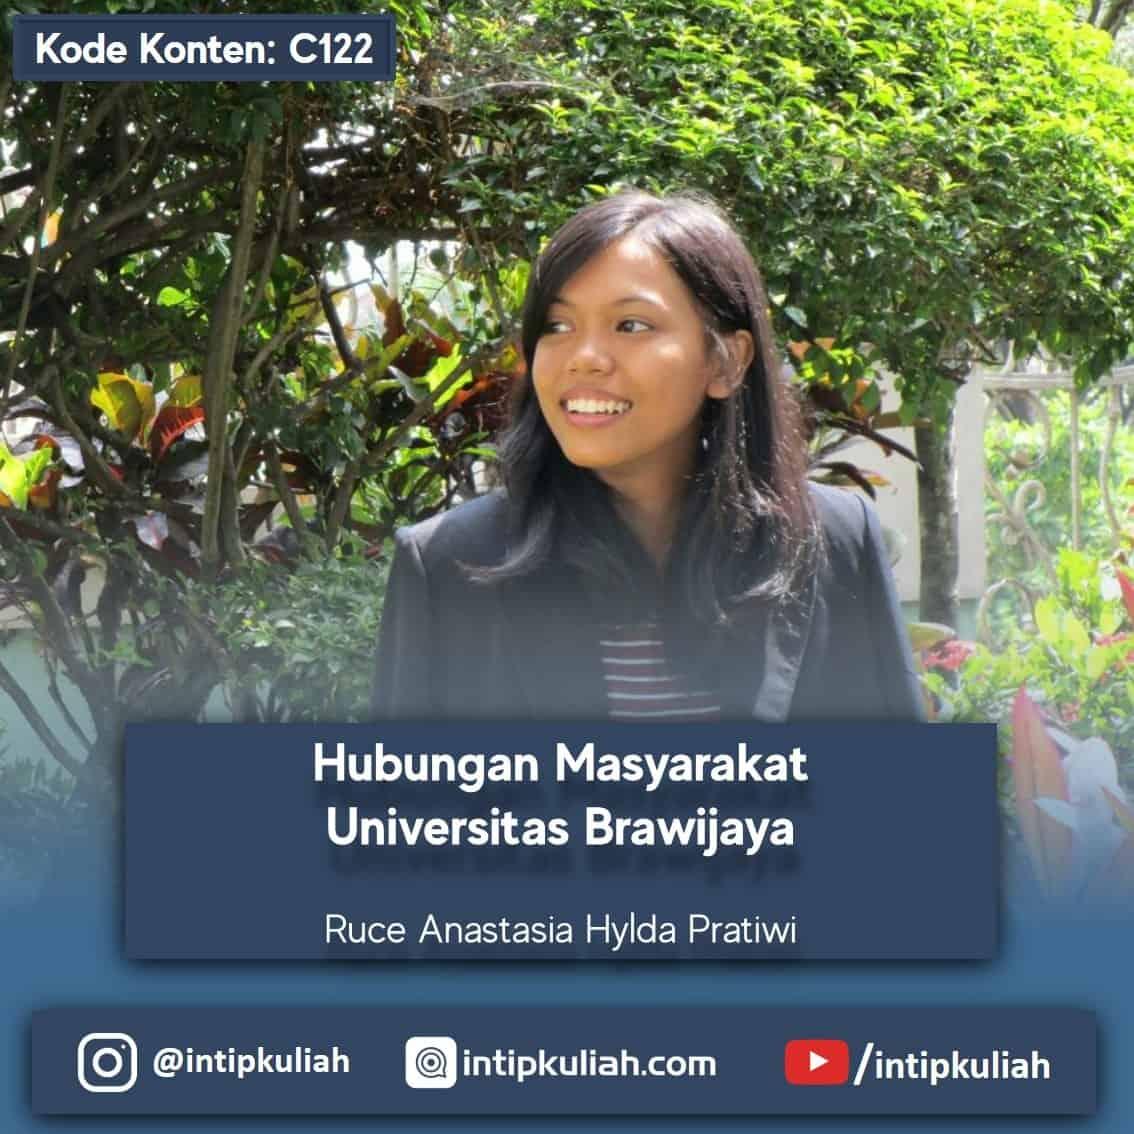 Hubungan Masyarakat Universitas Brawijaya (Hilda)